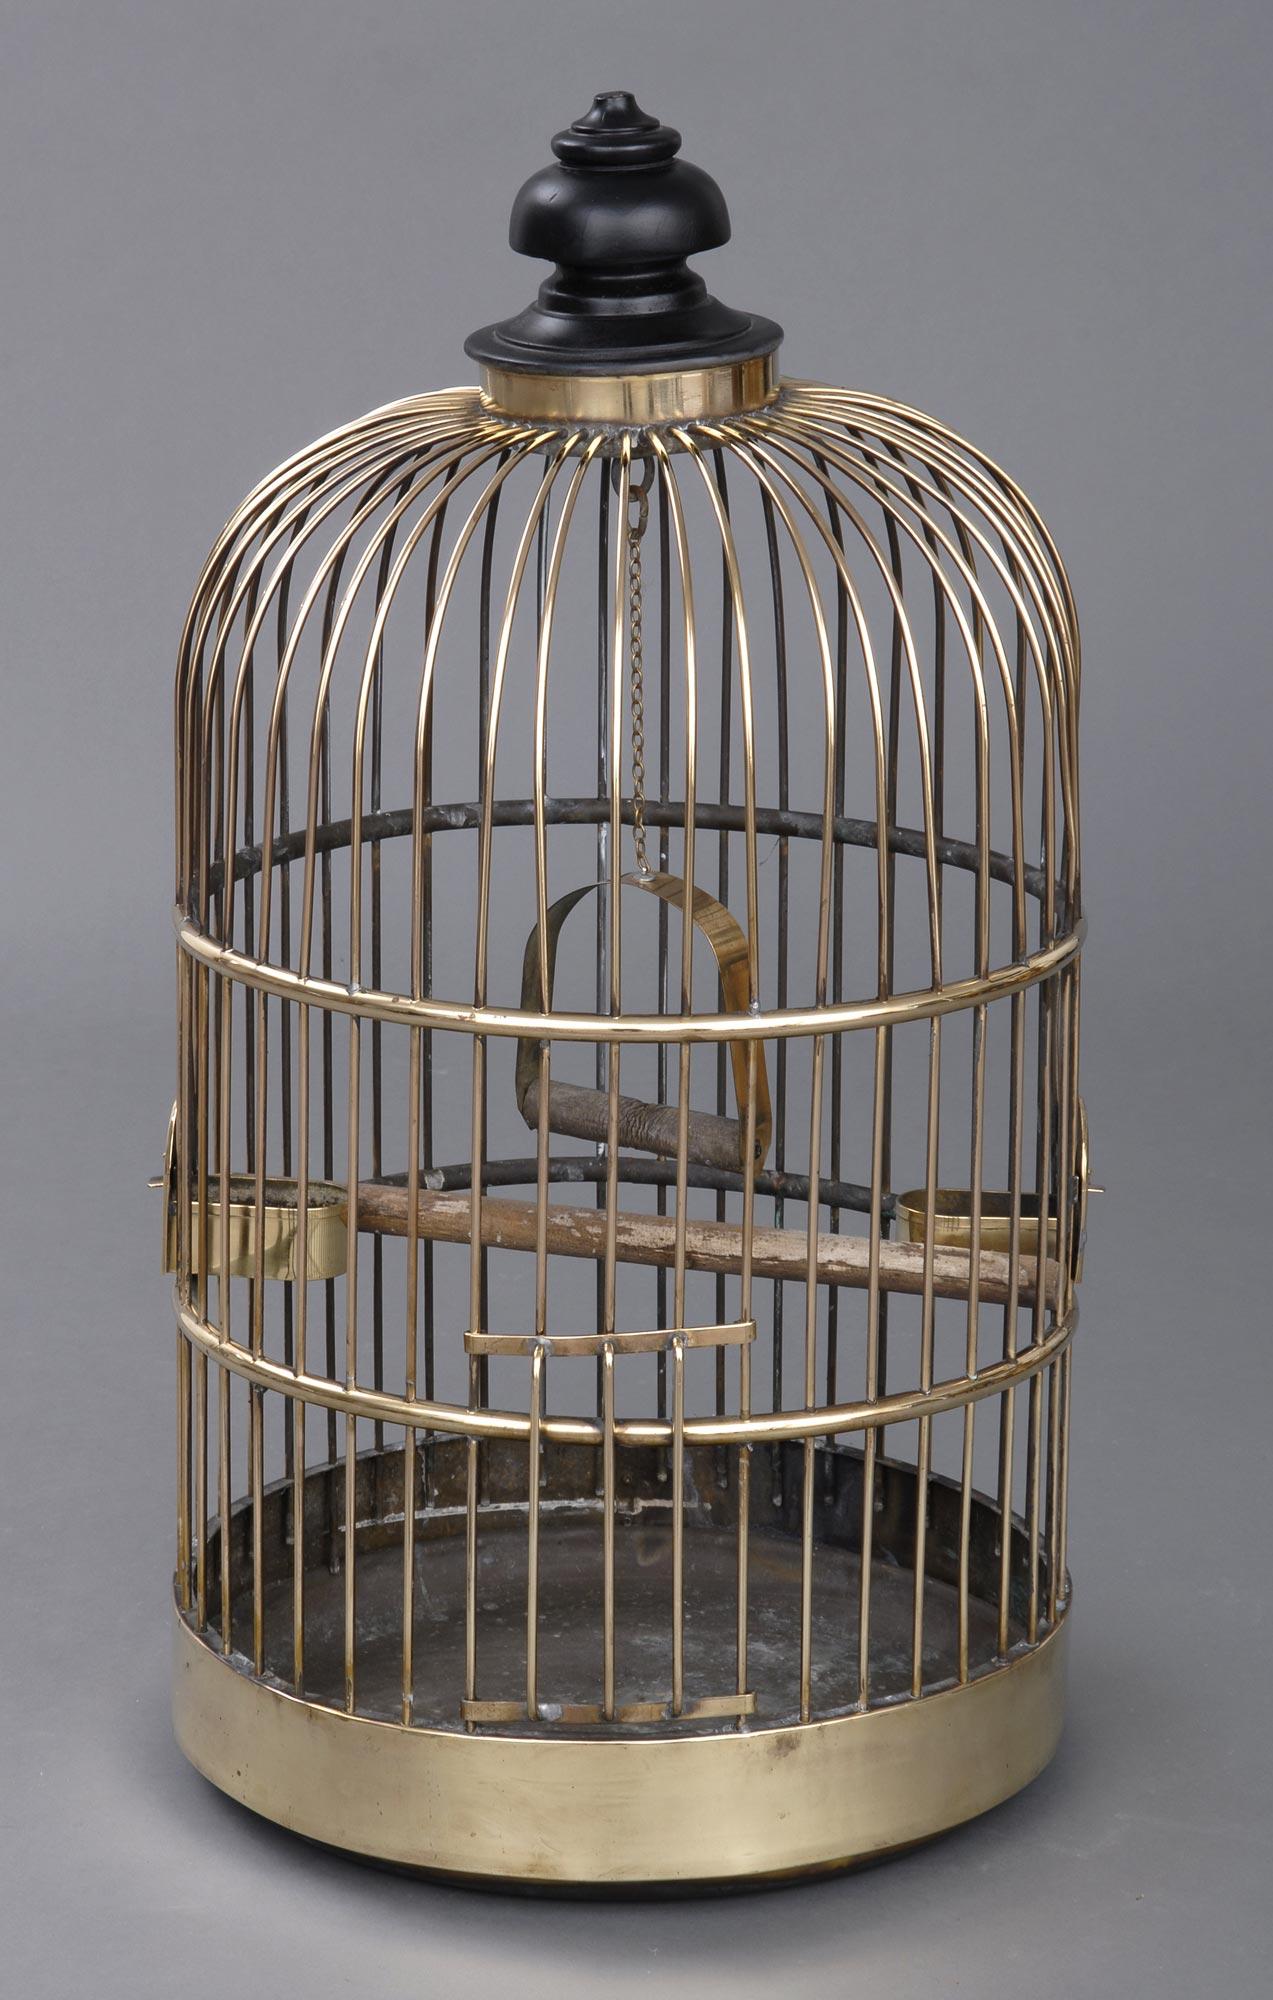 187 Product 187 Brass Bird Cage